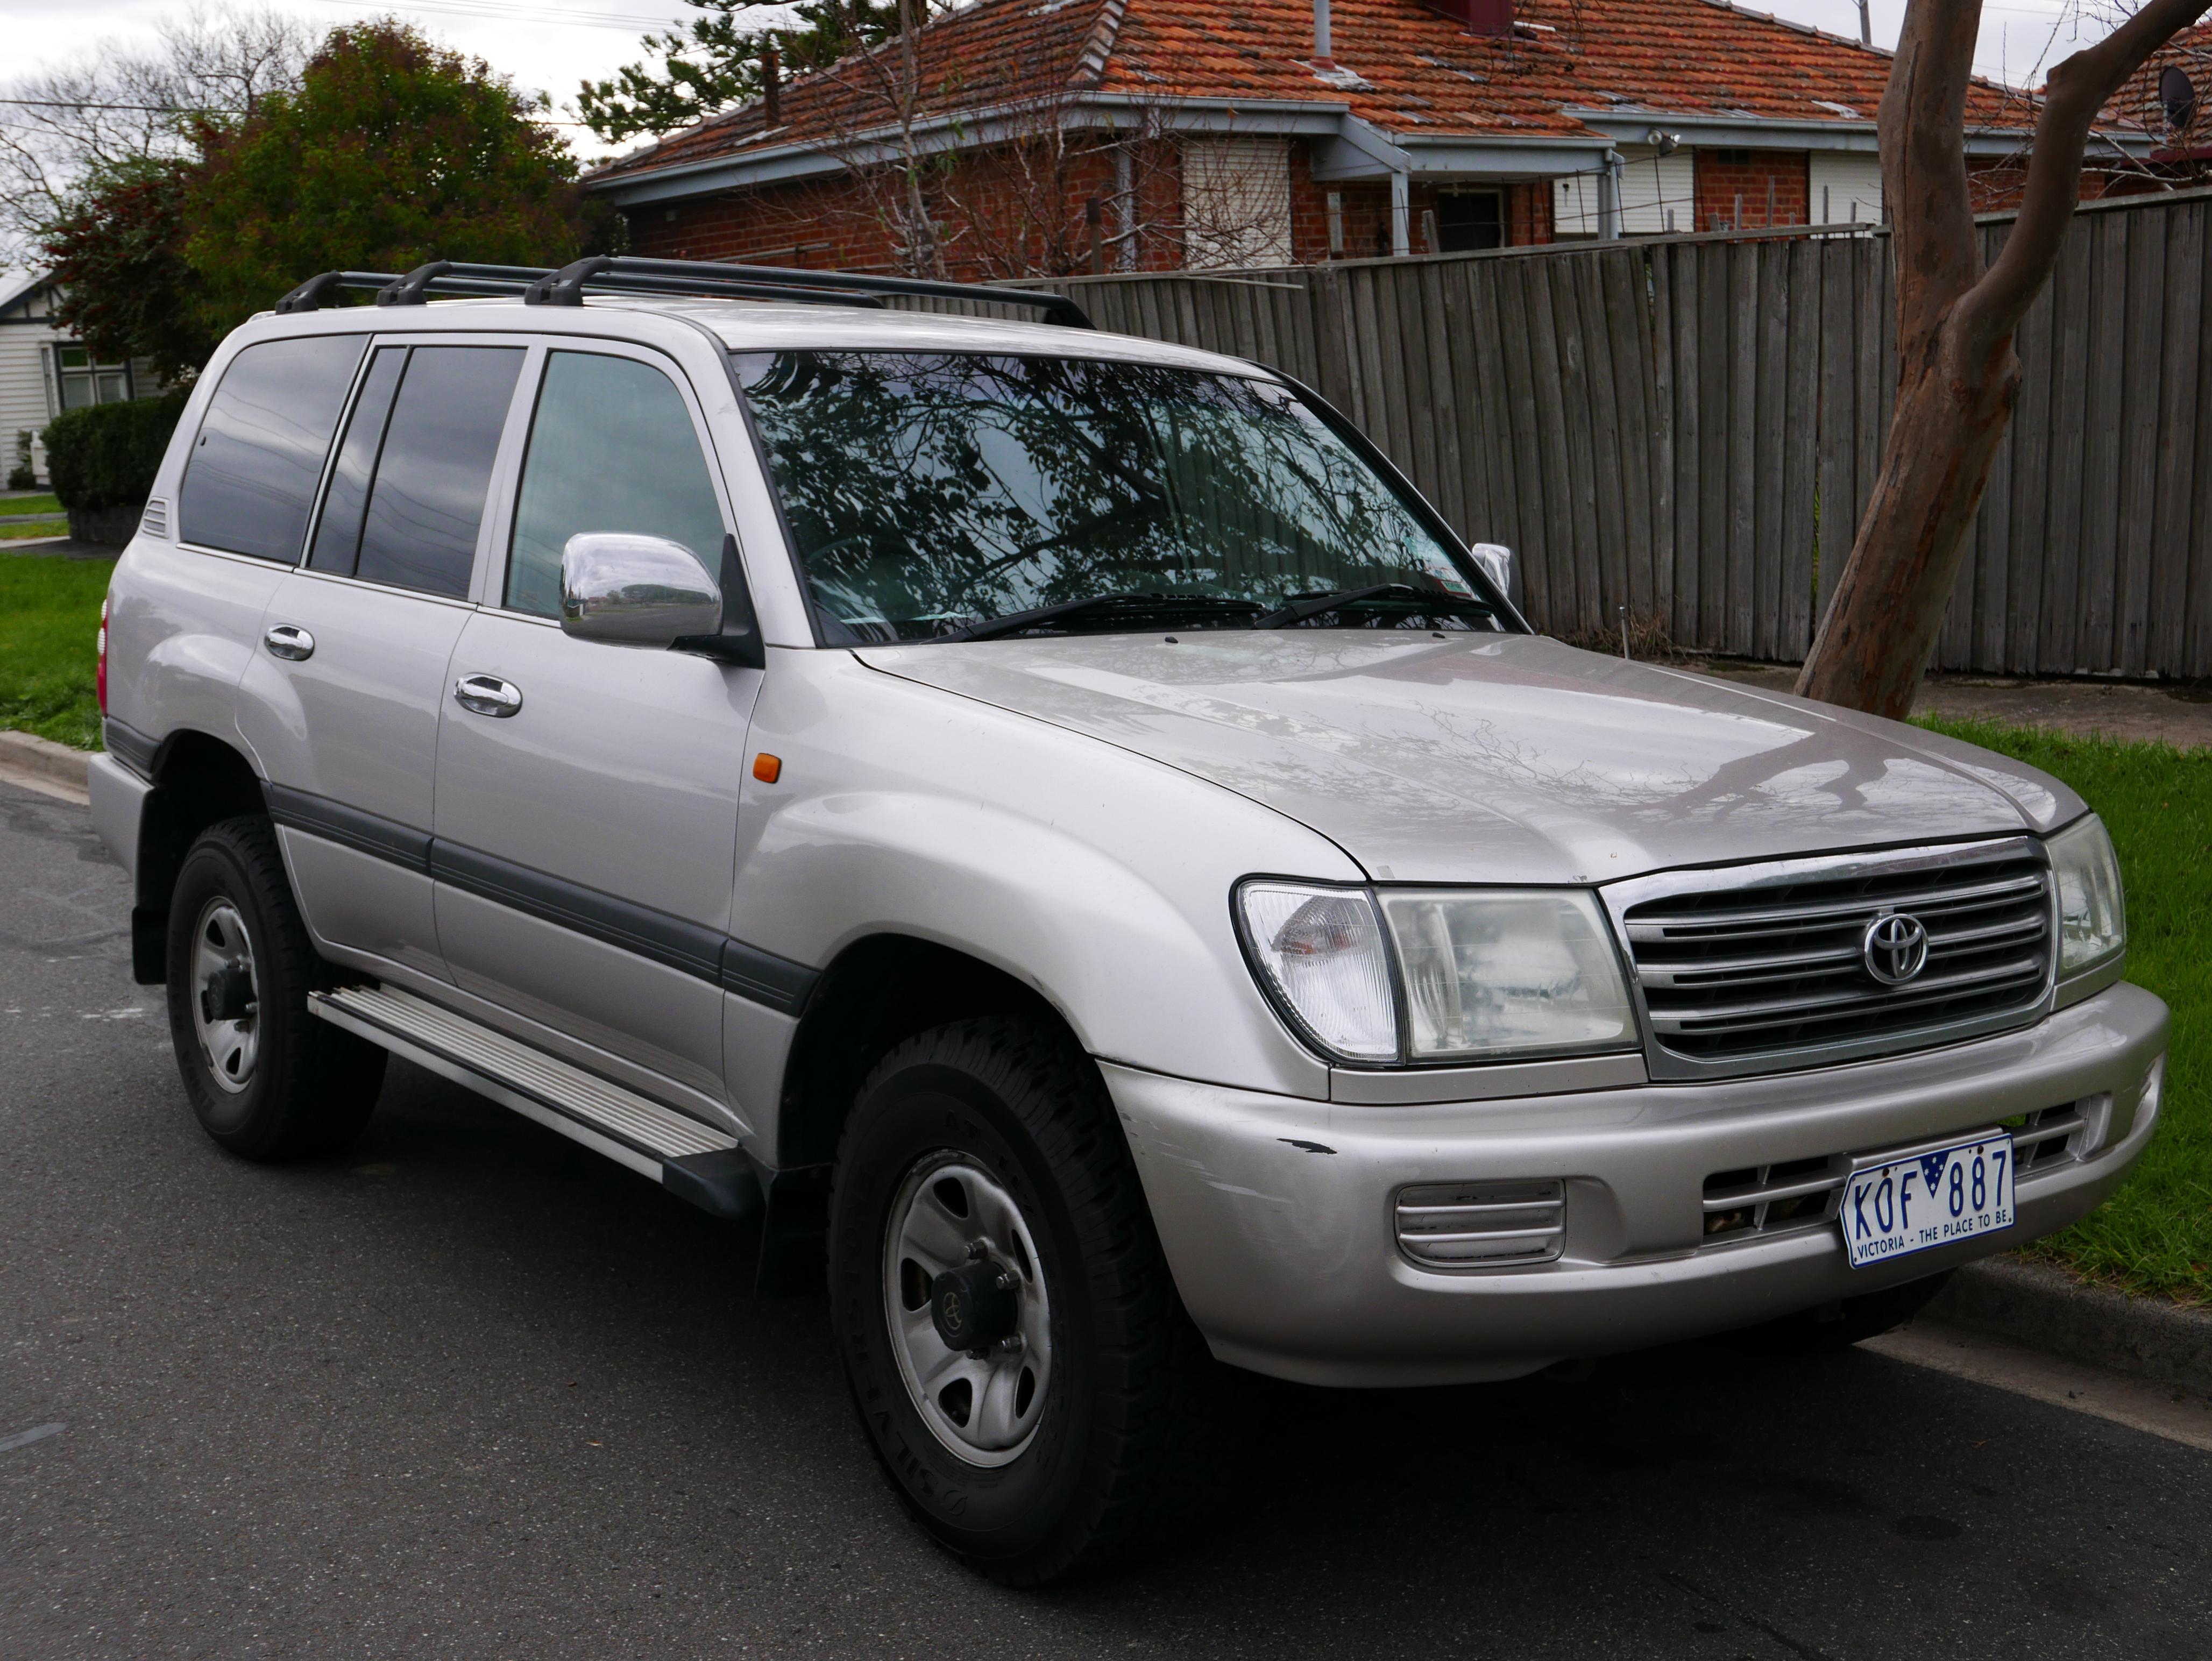 Kelebihan Kekurangan Toyota Land Cruiser 2004 Spesifikasi